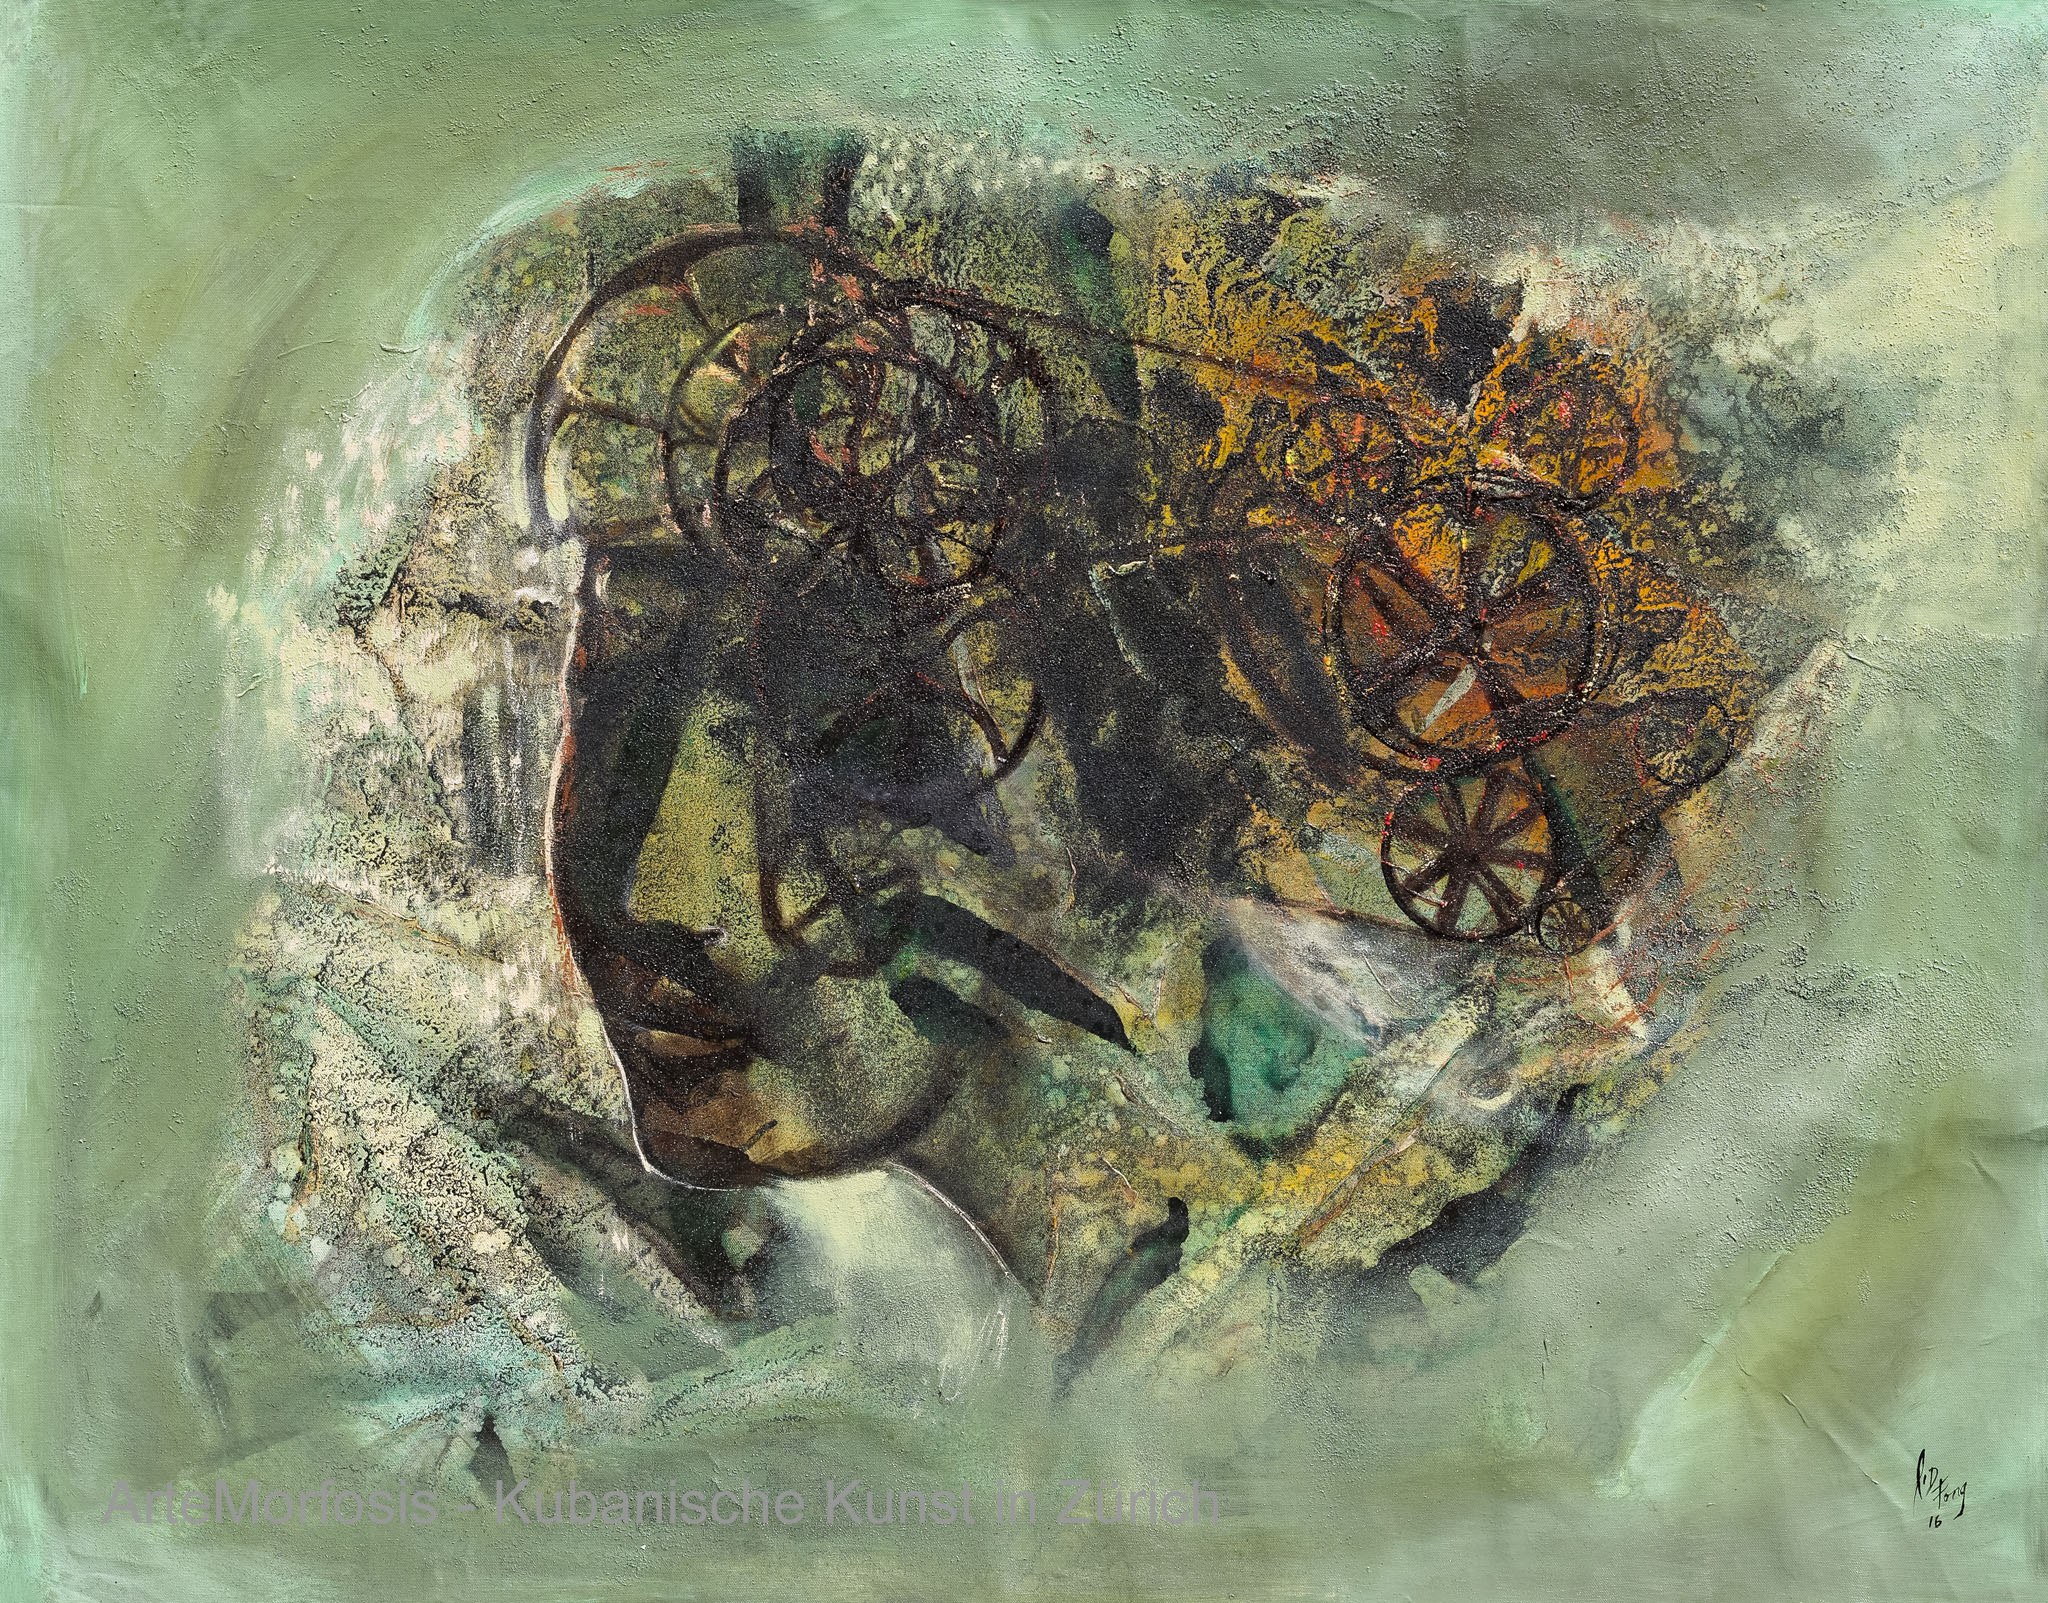 Li D Fong: Mecánica del recuerdo / Mechanics of Memory - Mixed on Canvas - 2016 - 92 x 118 cm